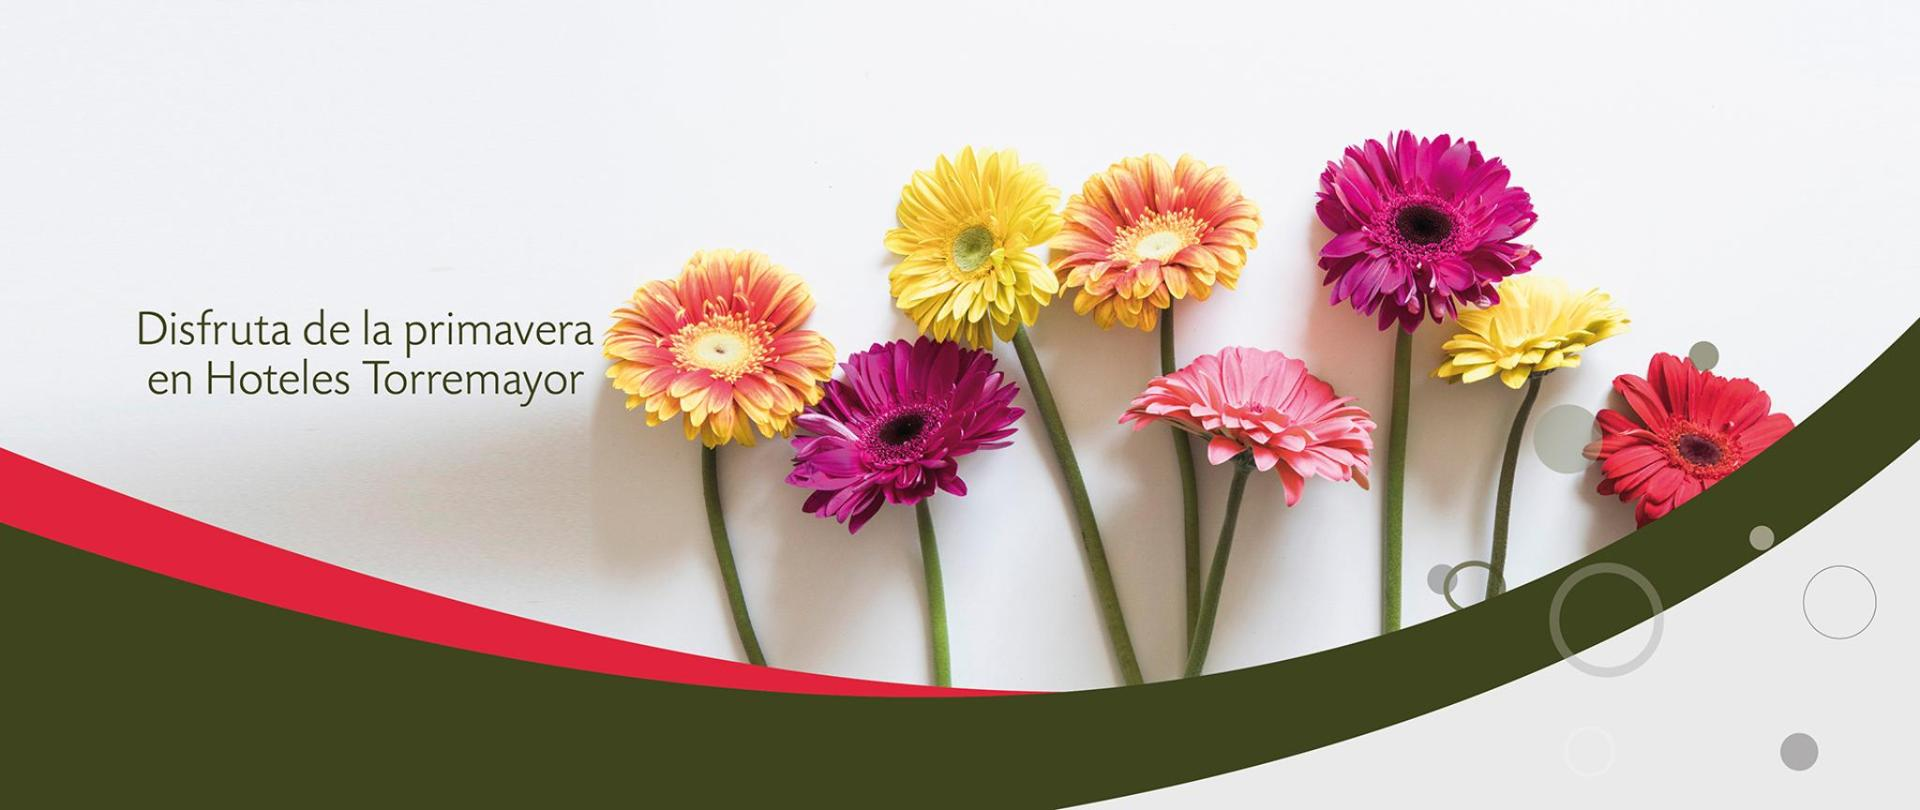 banner-primavera-01.jpg